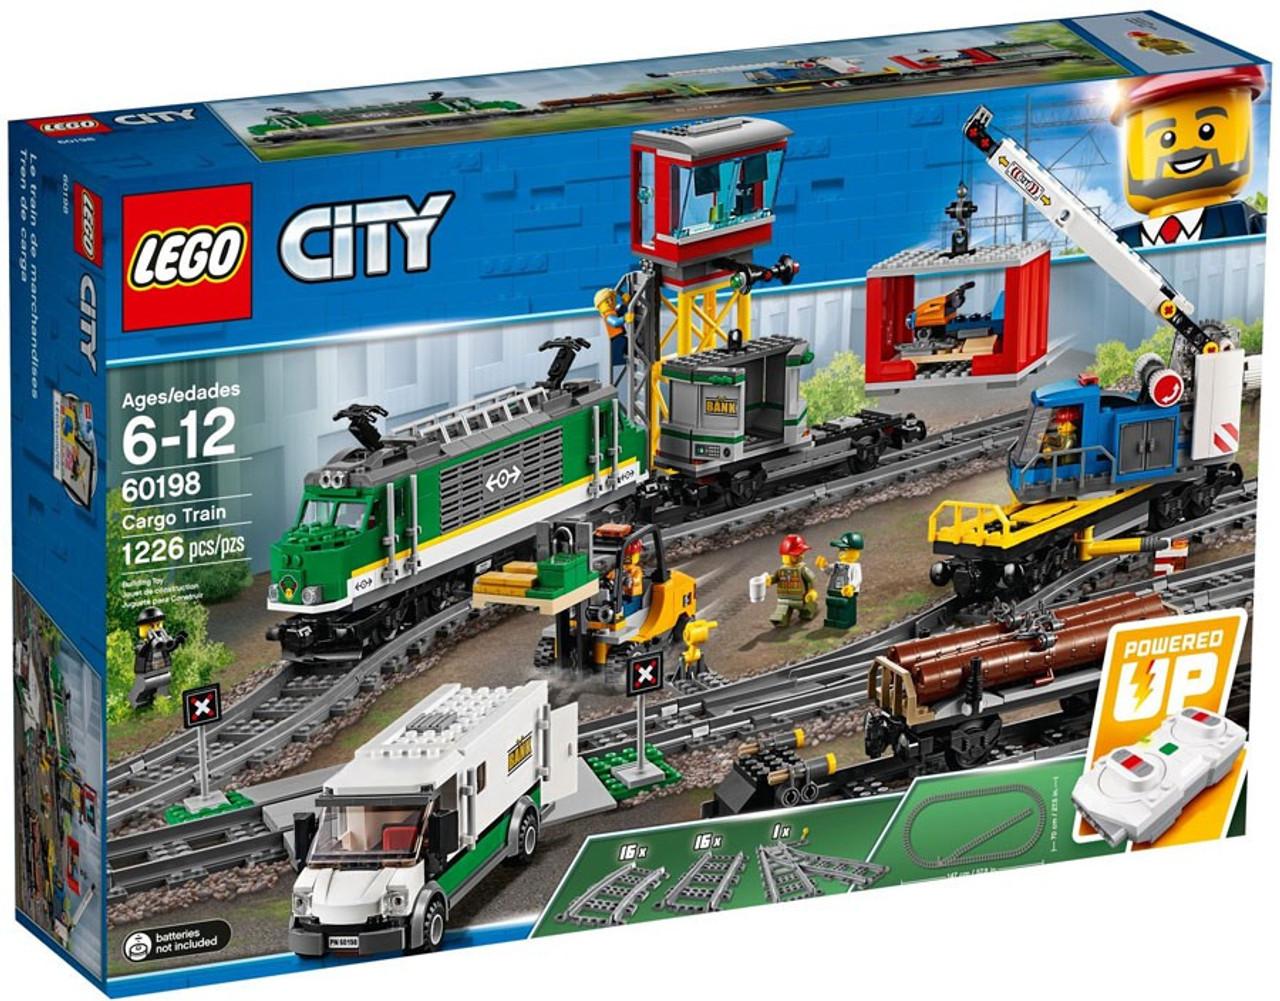 LEGO City Cargo Train Set 60198 - ToyWiz